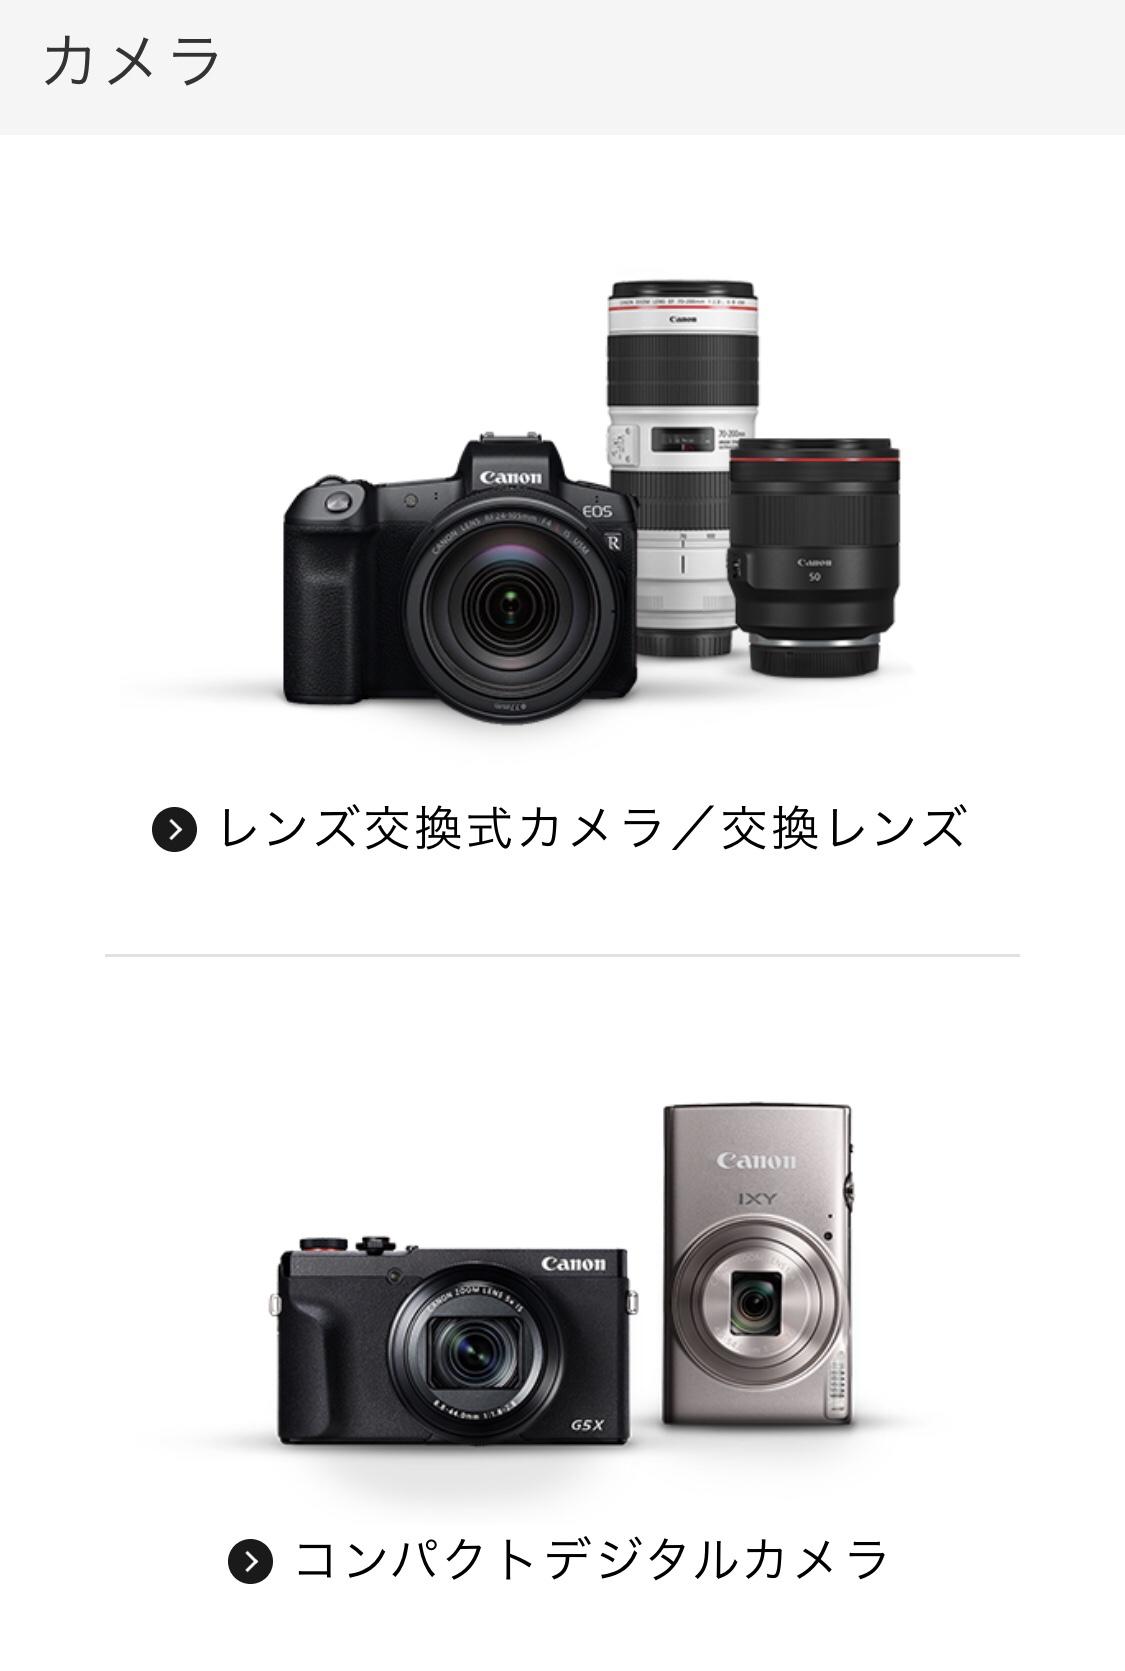 Canonのカメラ買取販売してますよ/実店舗のあるお店です